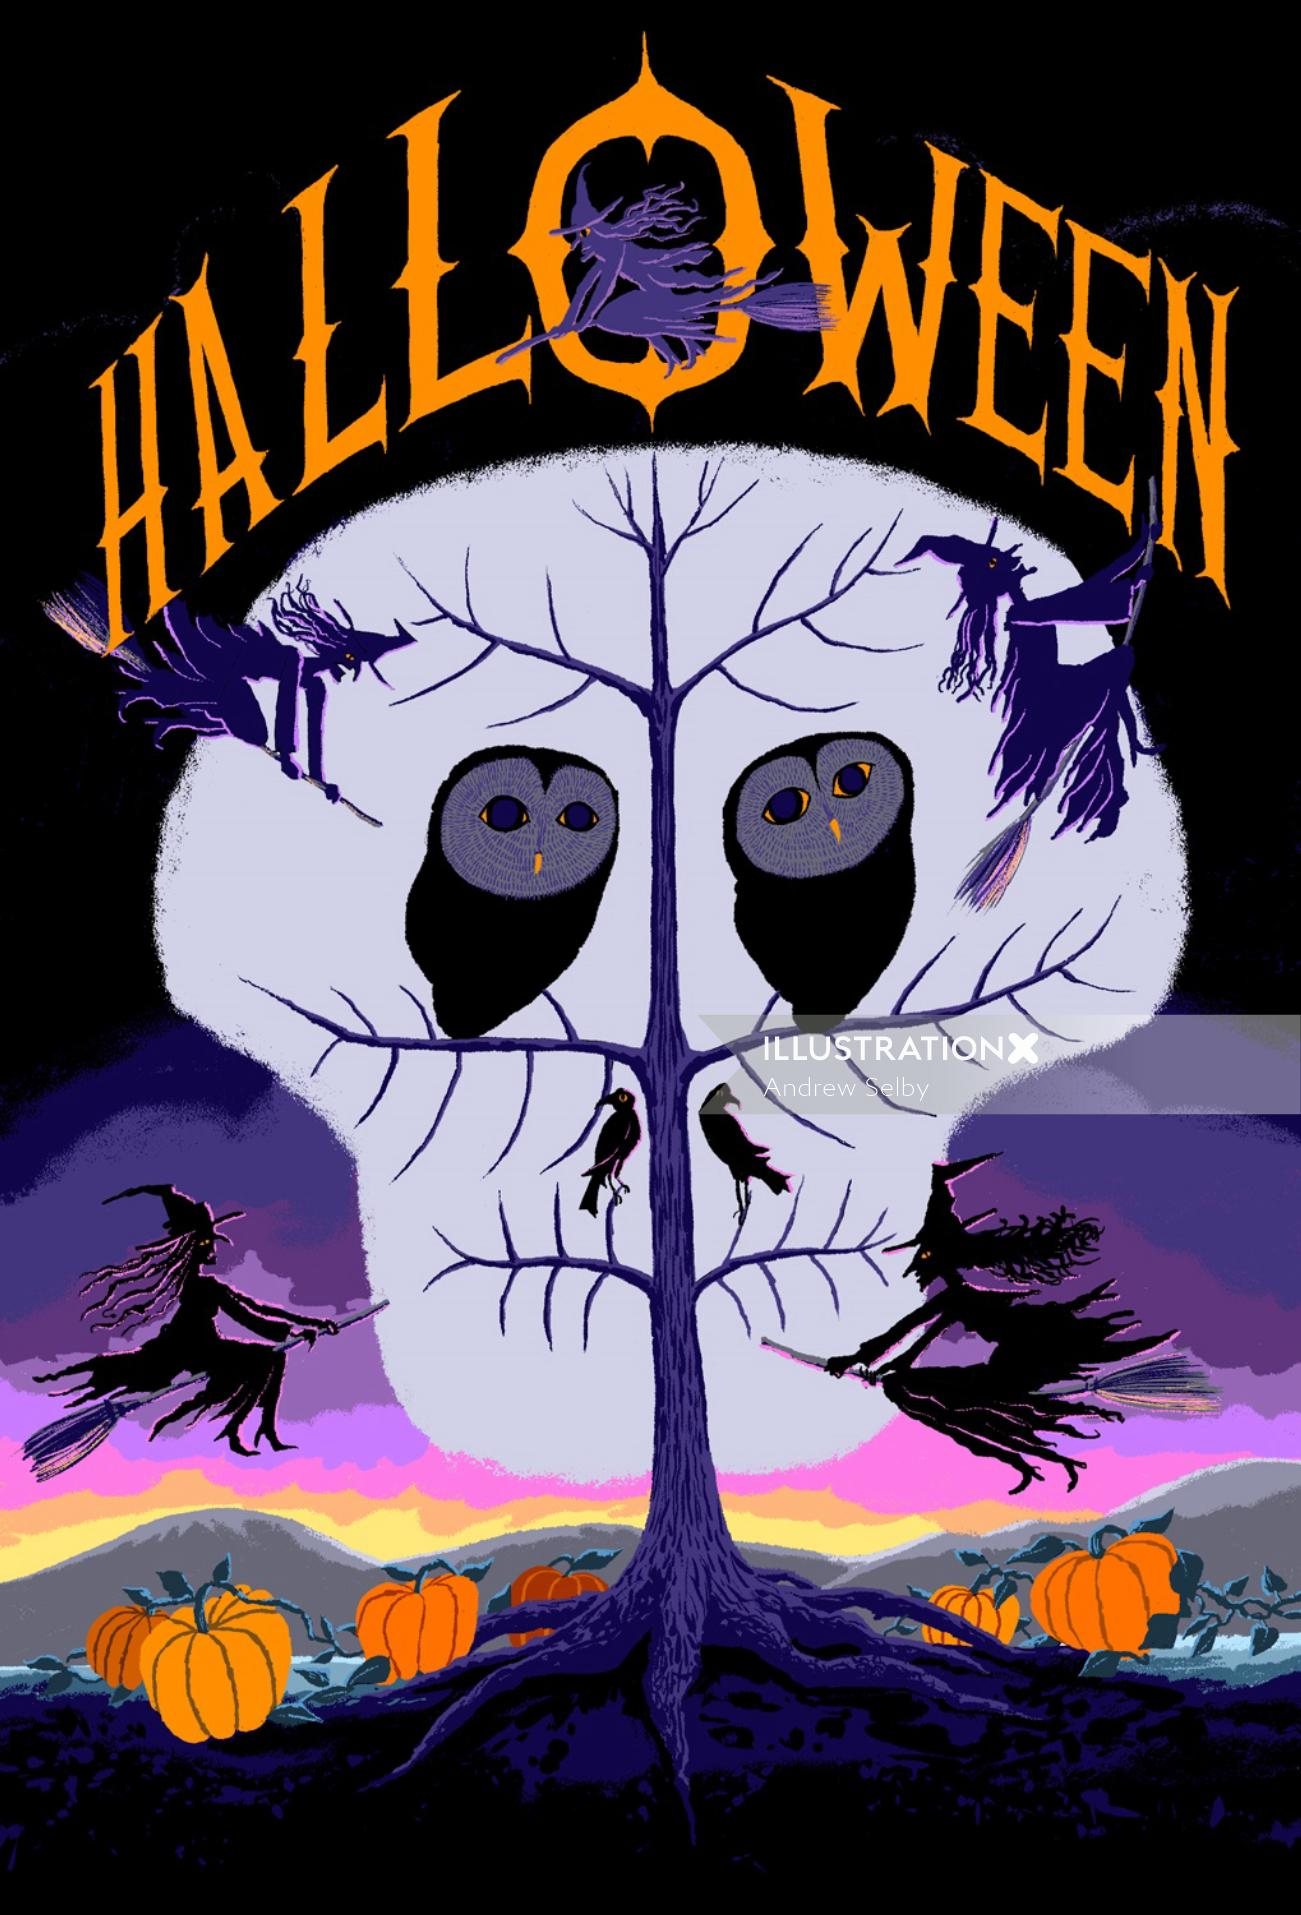 Conceptual Halloween Illustration